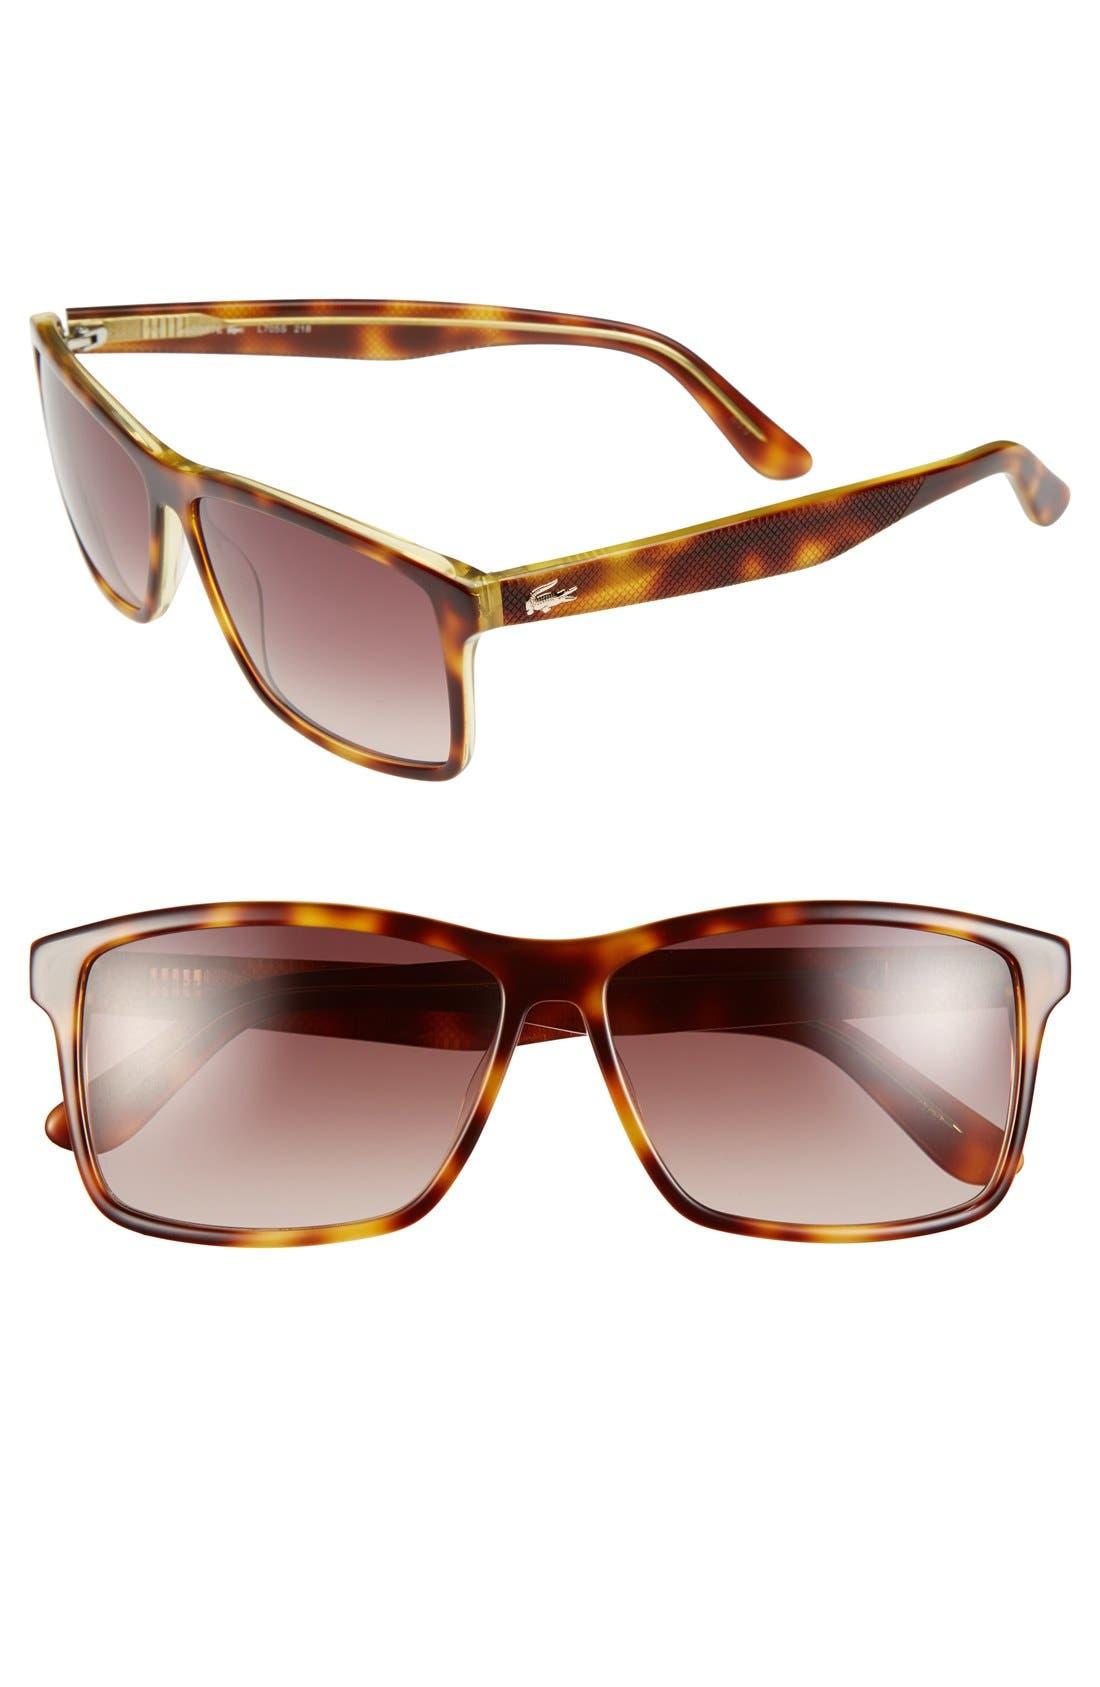 Main Image - Lacoste 57mm Sunglasses